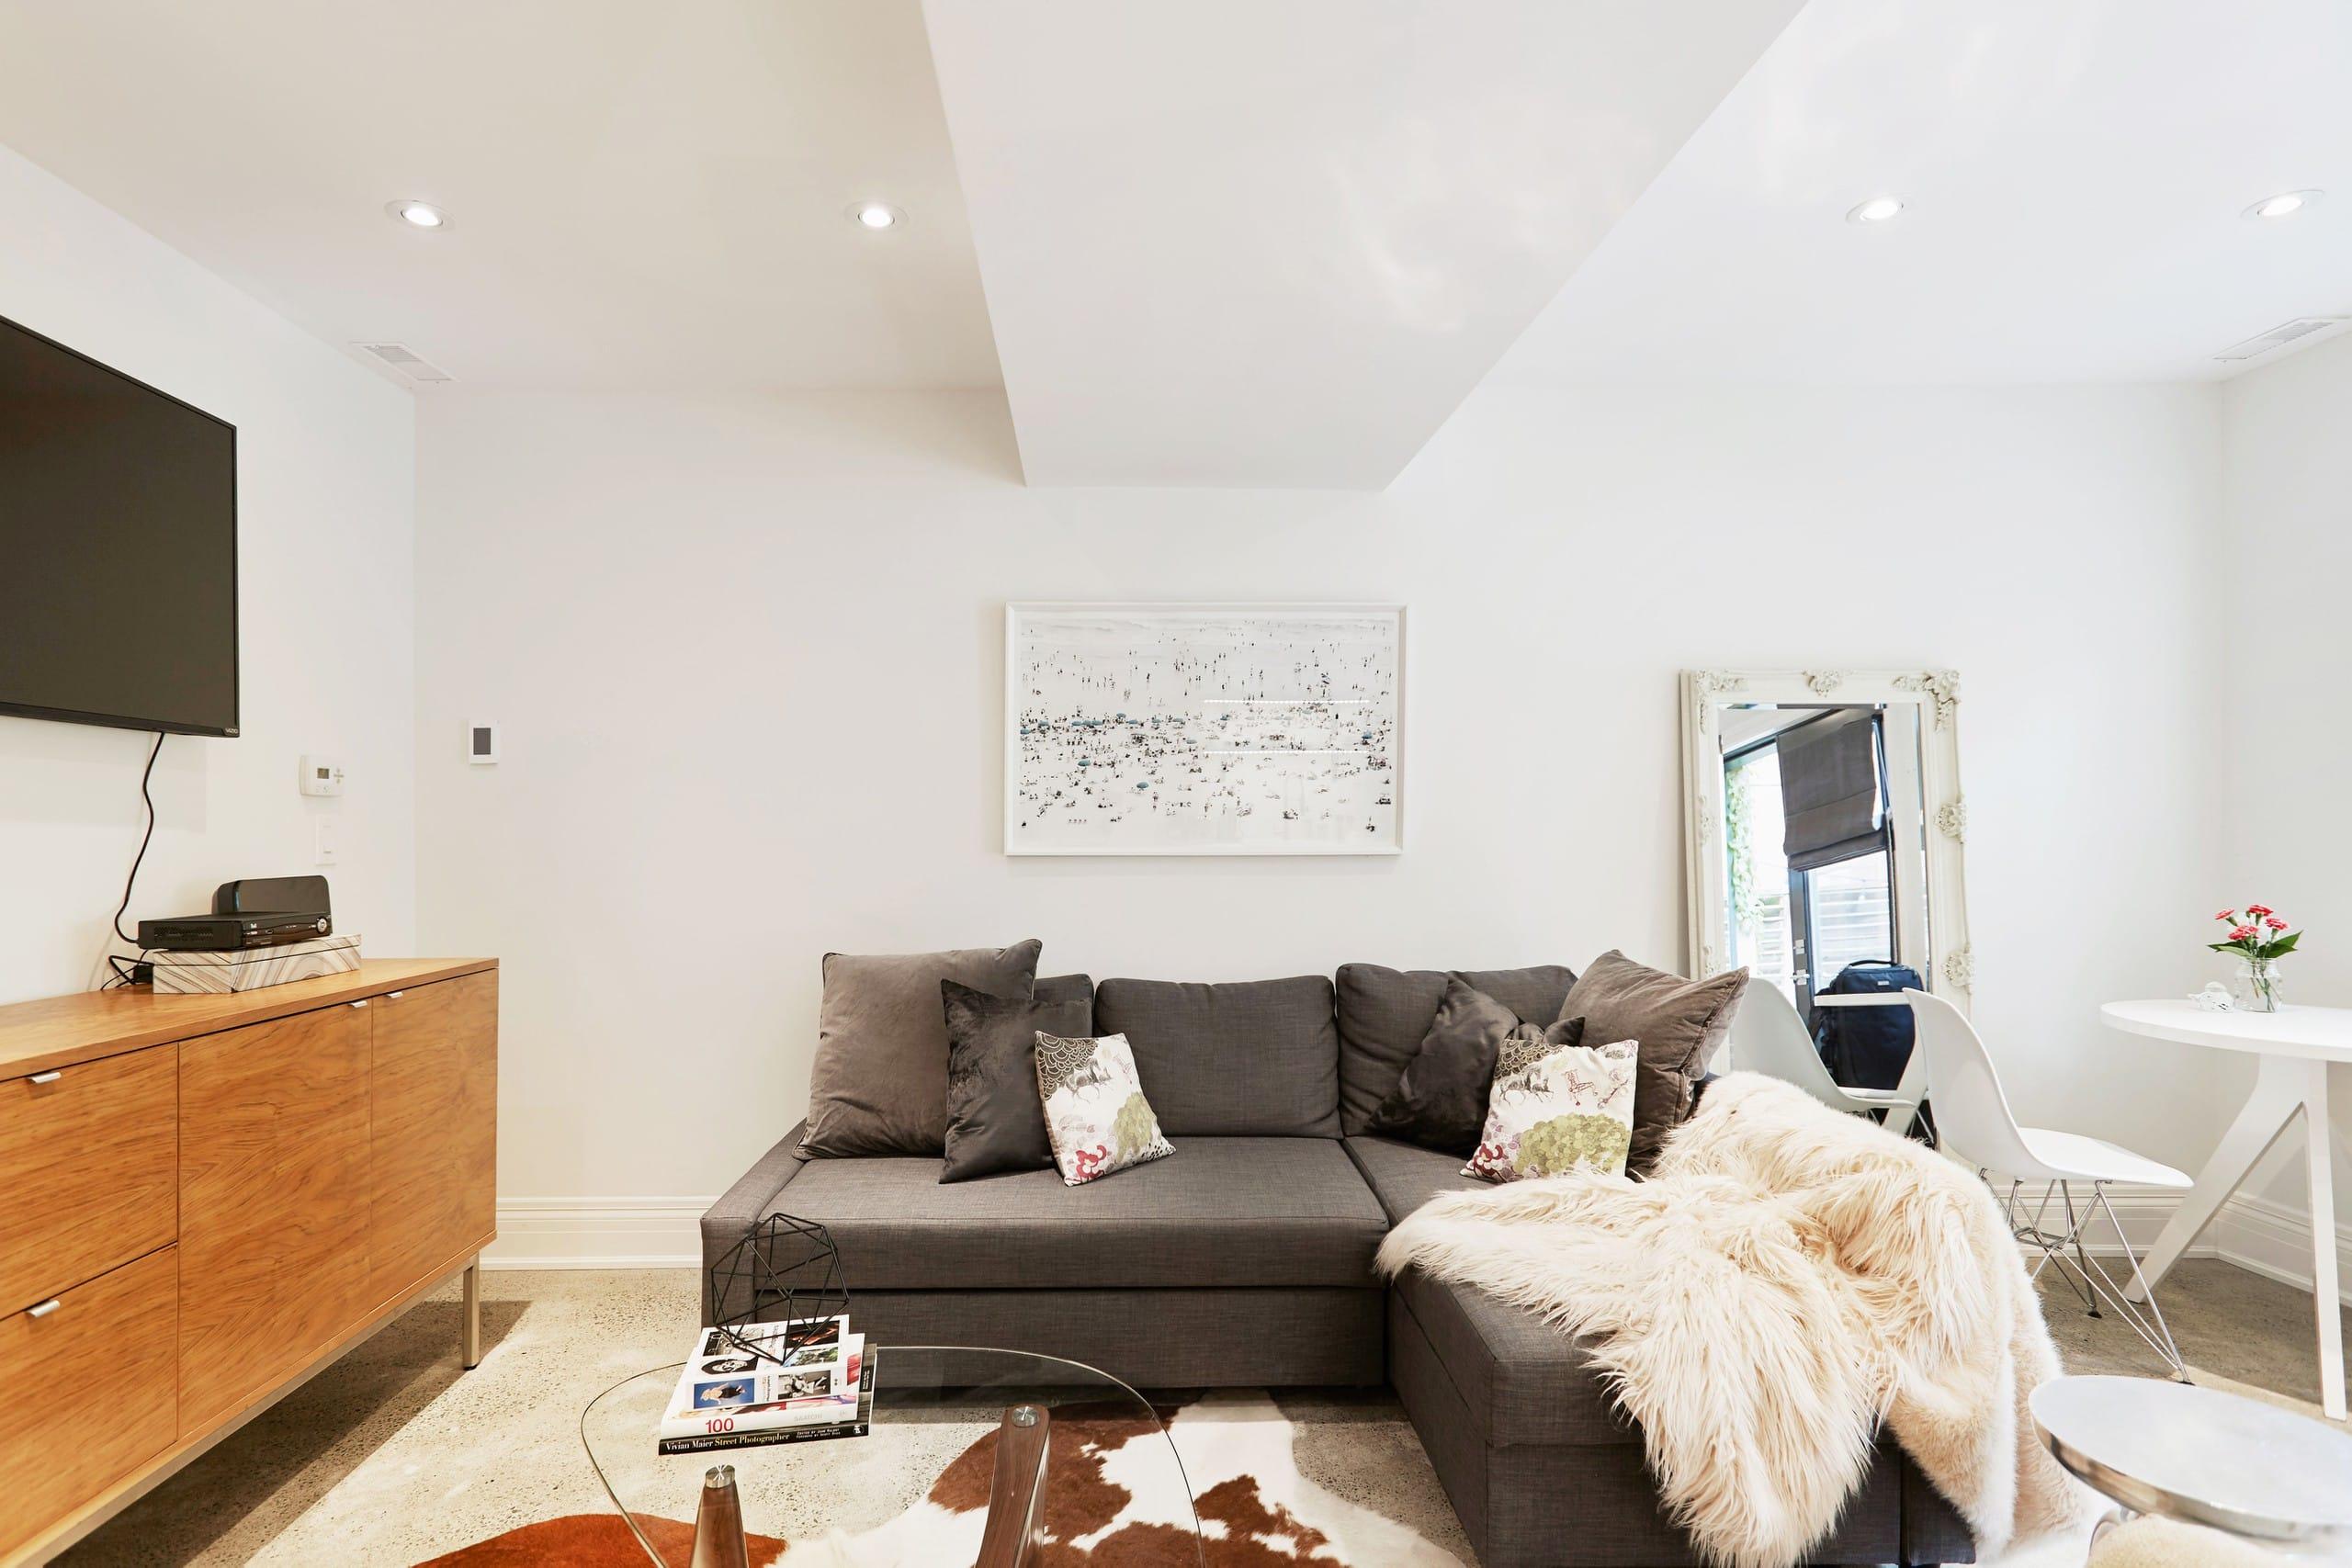 Top 100 Airbnb Rentals 2017 in Toronto, Canada